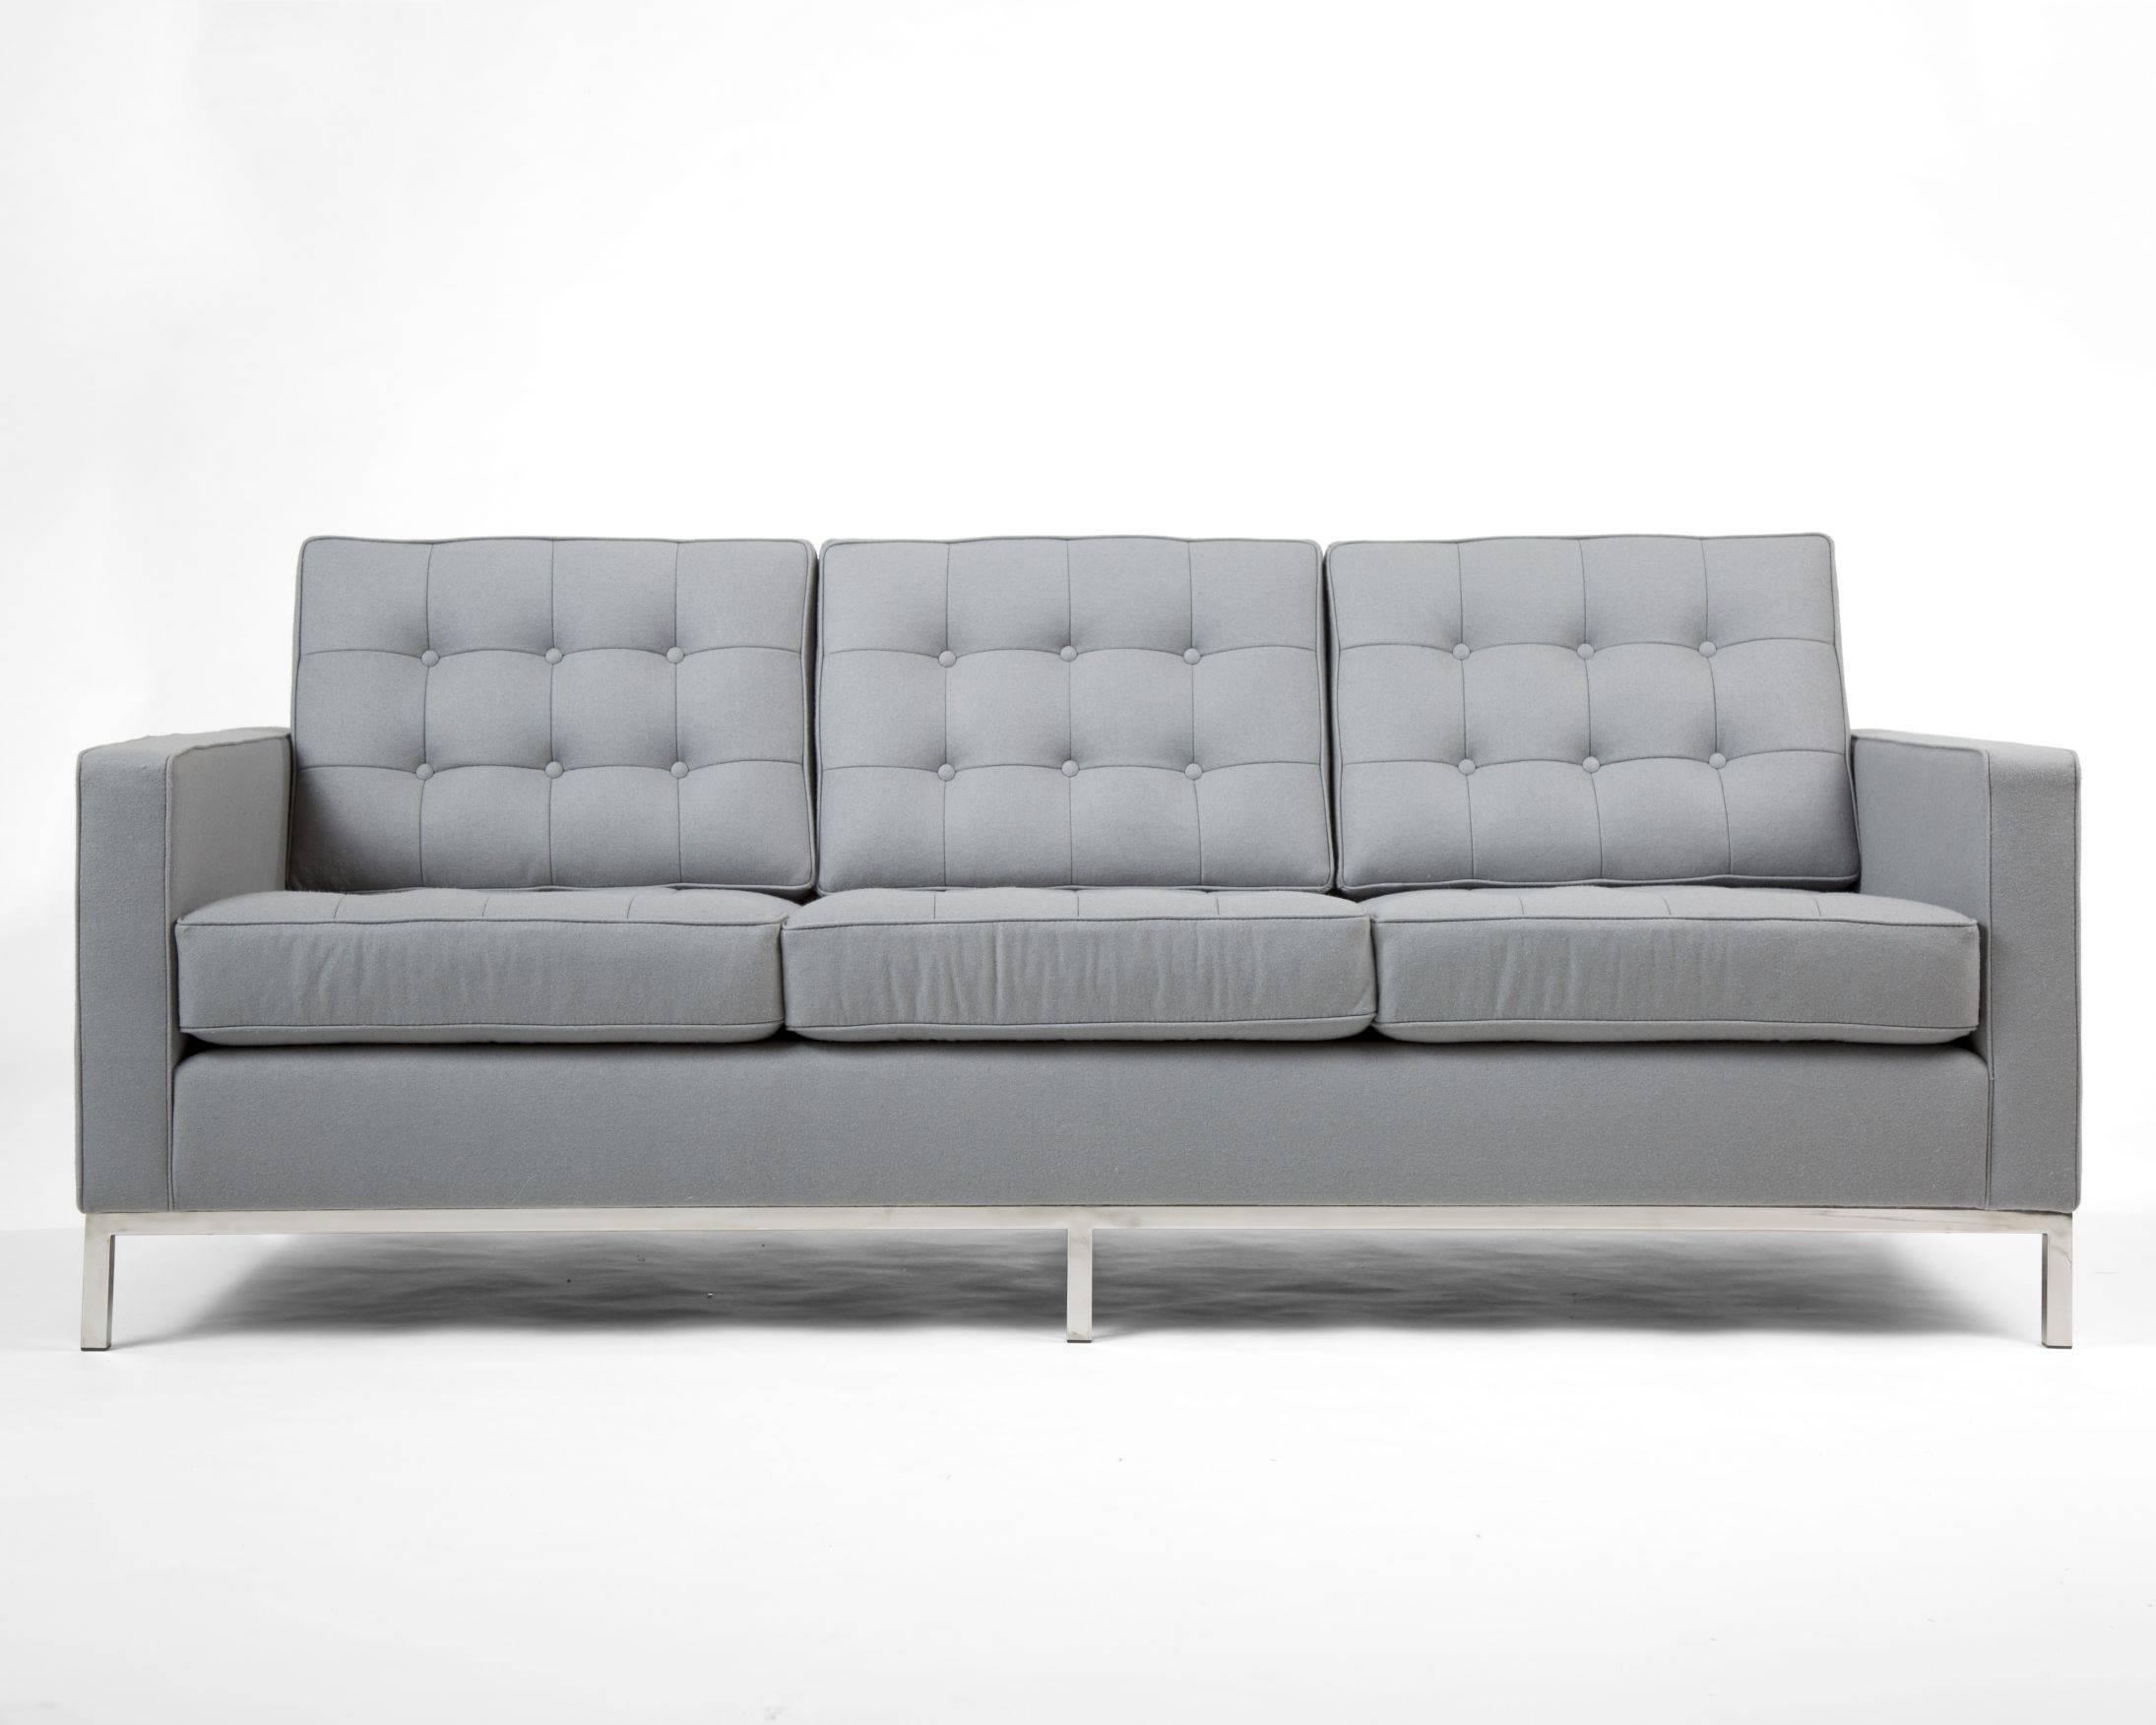 Florence Sofa | Reproduction | Mid Century Modern regarding Florence Large Sofas (Image 10 of 30)